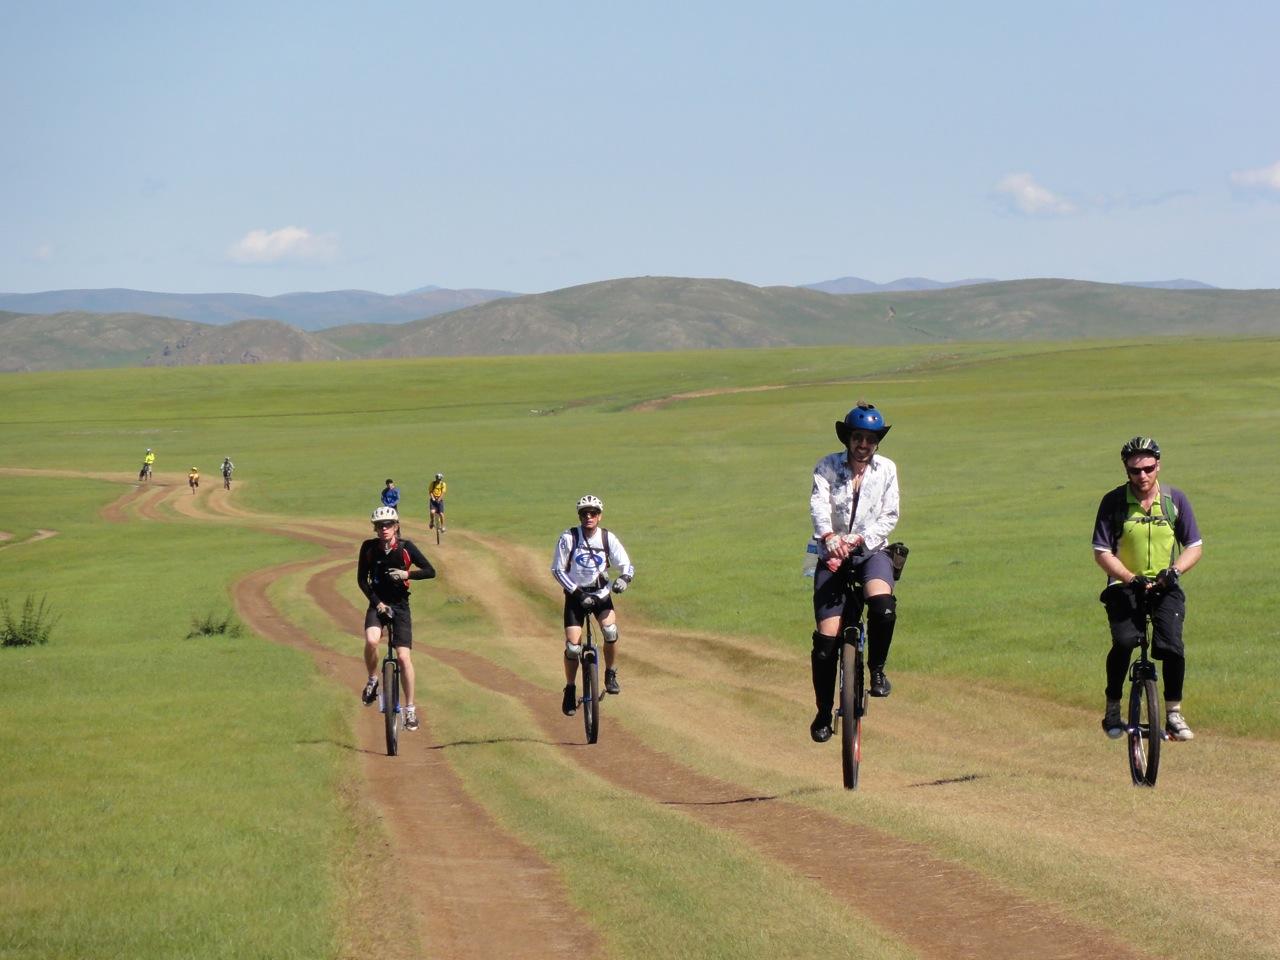 balade en Mongolie